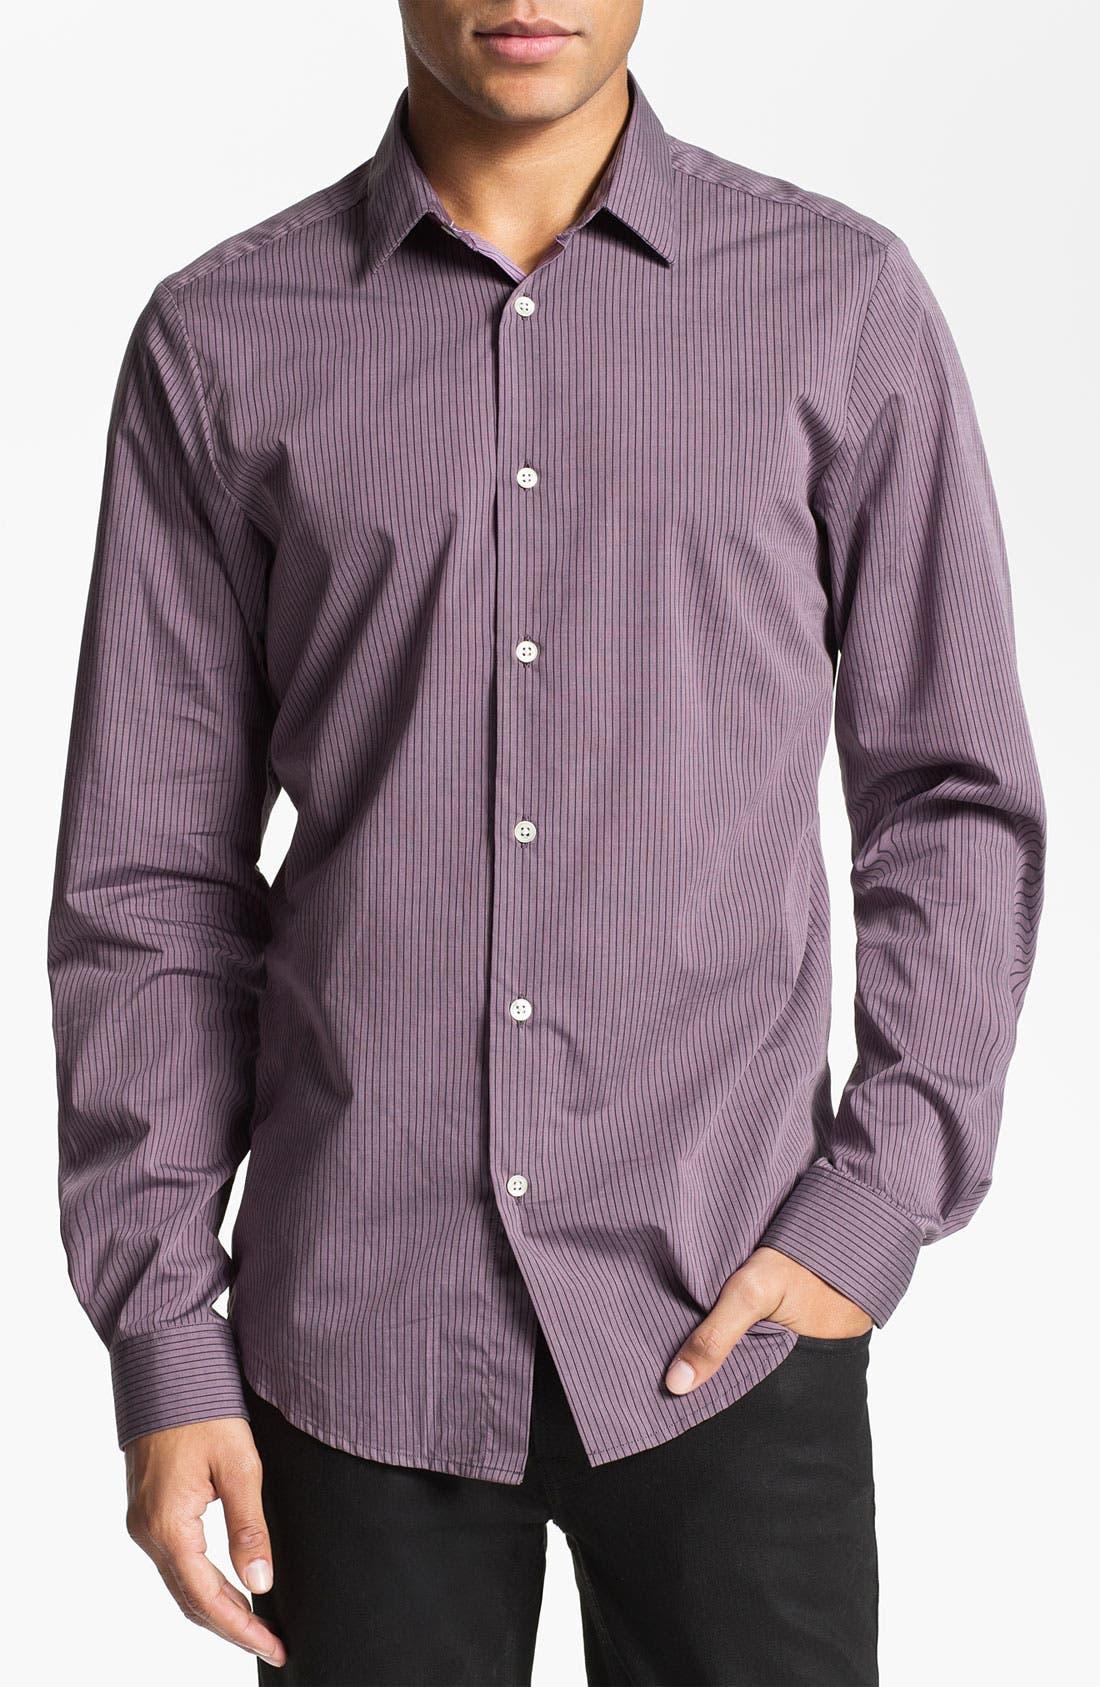 Main Image - PLECTRUM by Ben Sherman 'Shoreditch' Stripe Woven Shirt